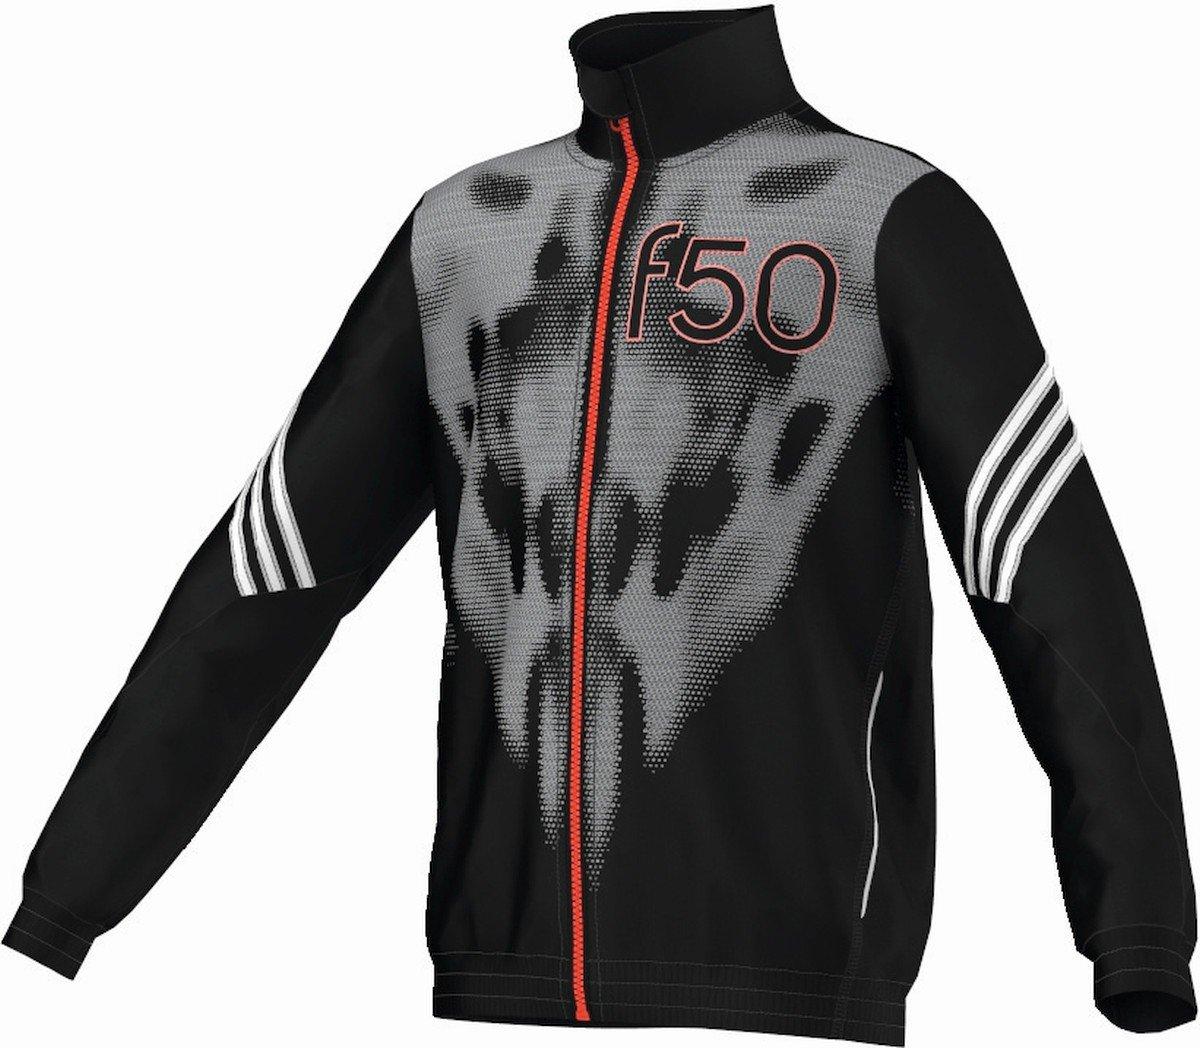 Adidas F50 Chaqueta de chándal niños Negro/Blanco/Rojo Talla:17 ...